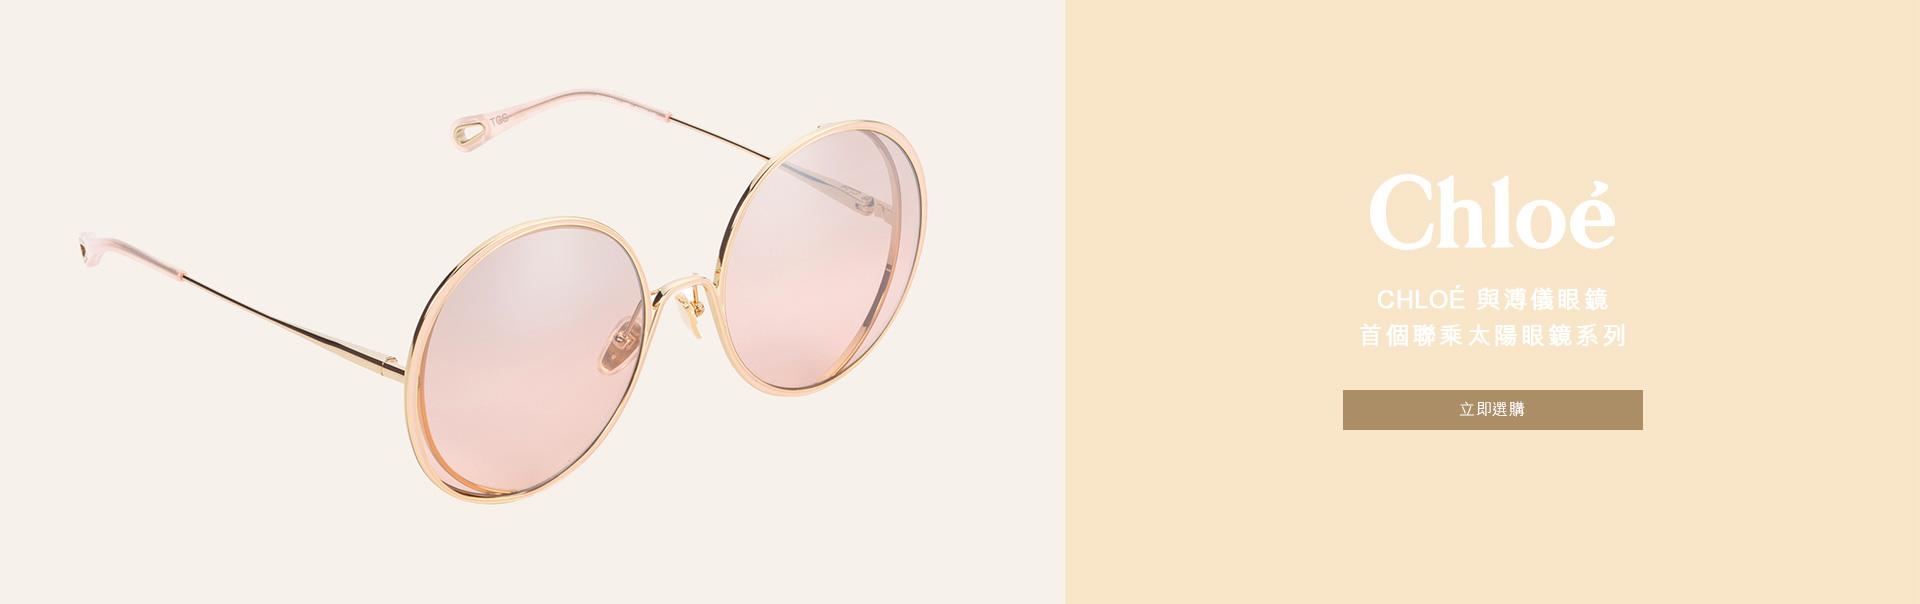 Chloé 與溥儀眼鏡 首個聯乘太陽眼鏡系列